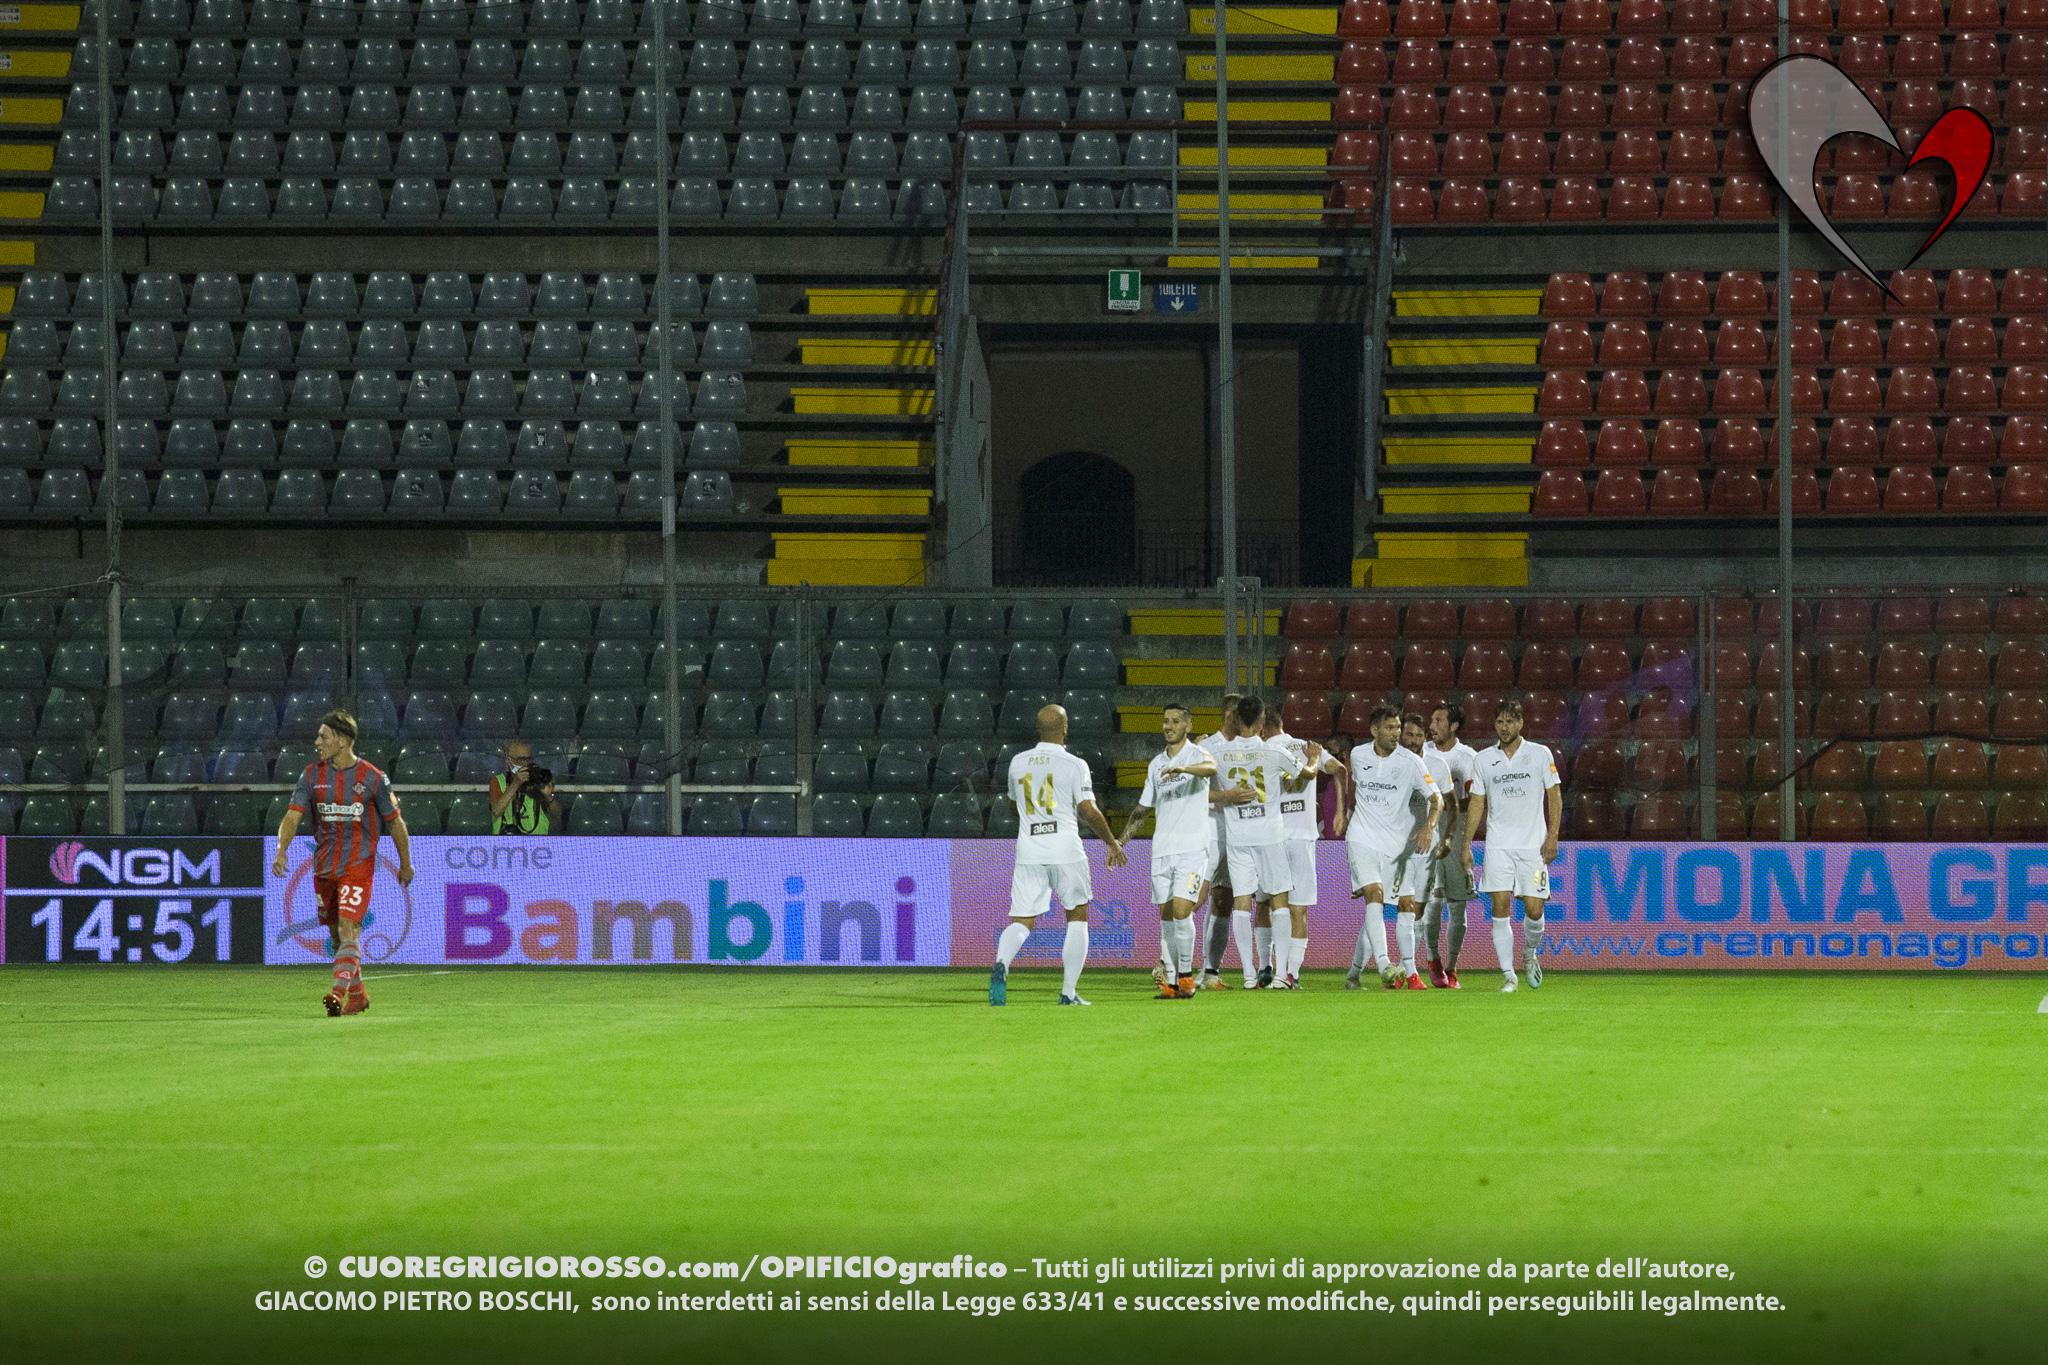 Serie B, Chievo e Pordenone vedono la finale. Oggi i playout